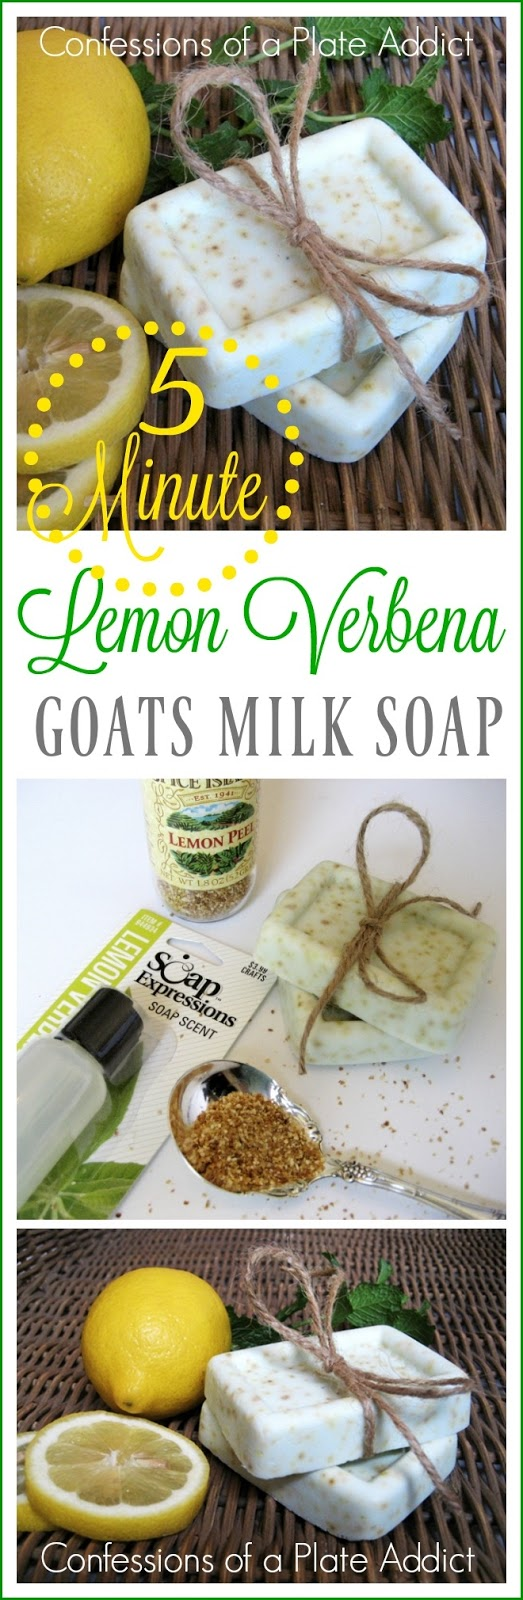 Lemon Verbena Soap Recipe